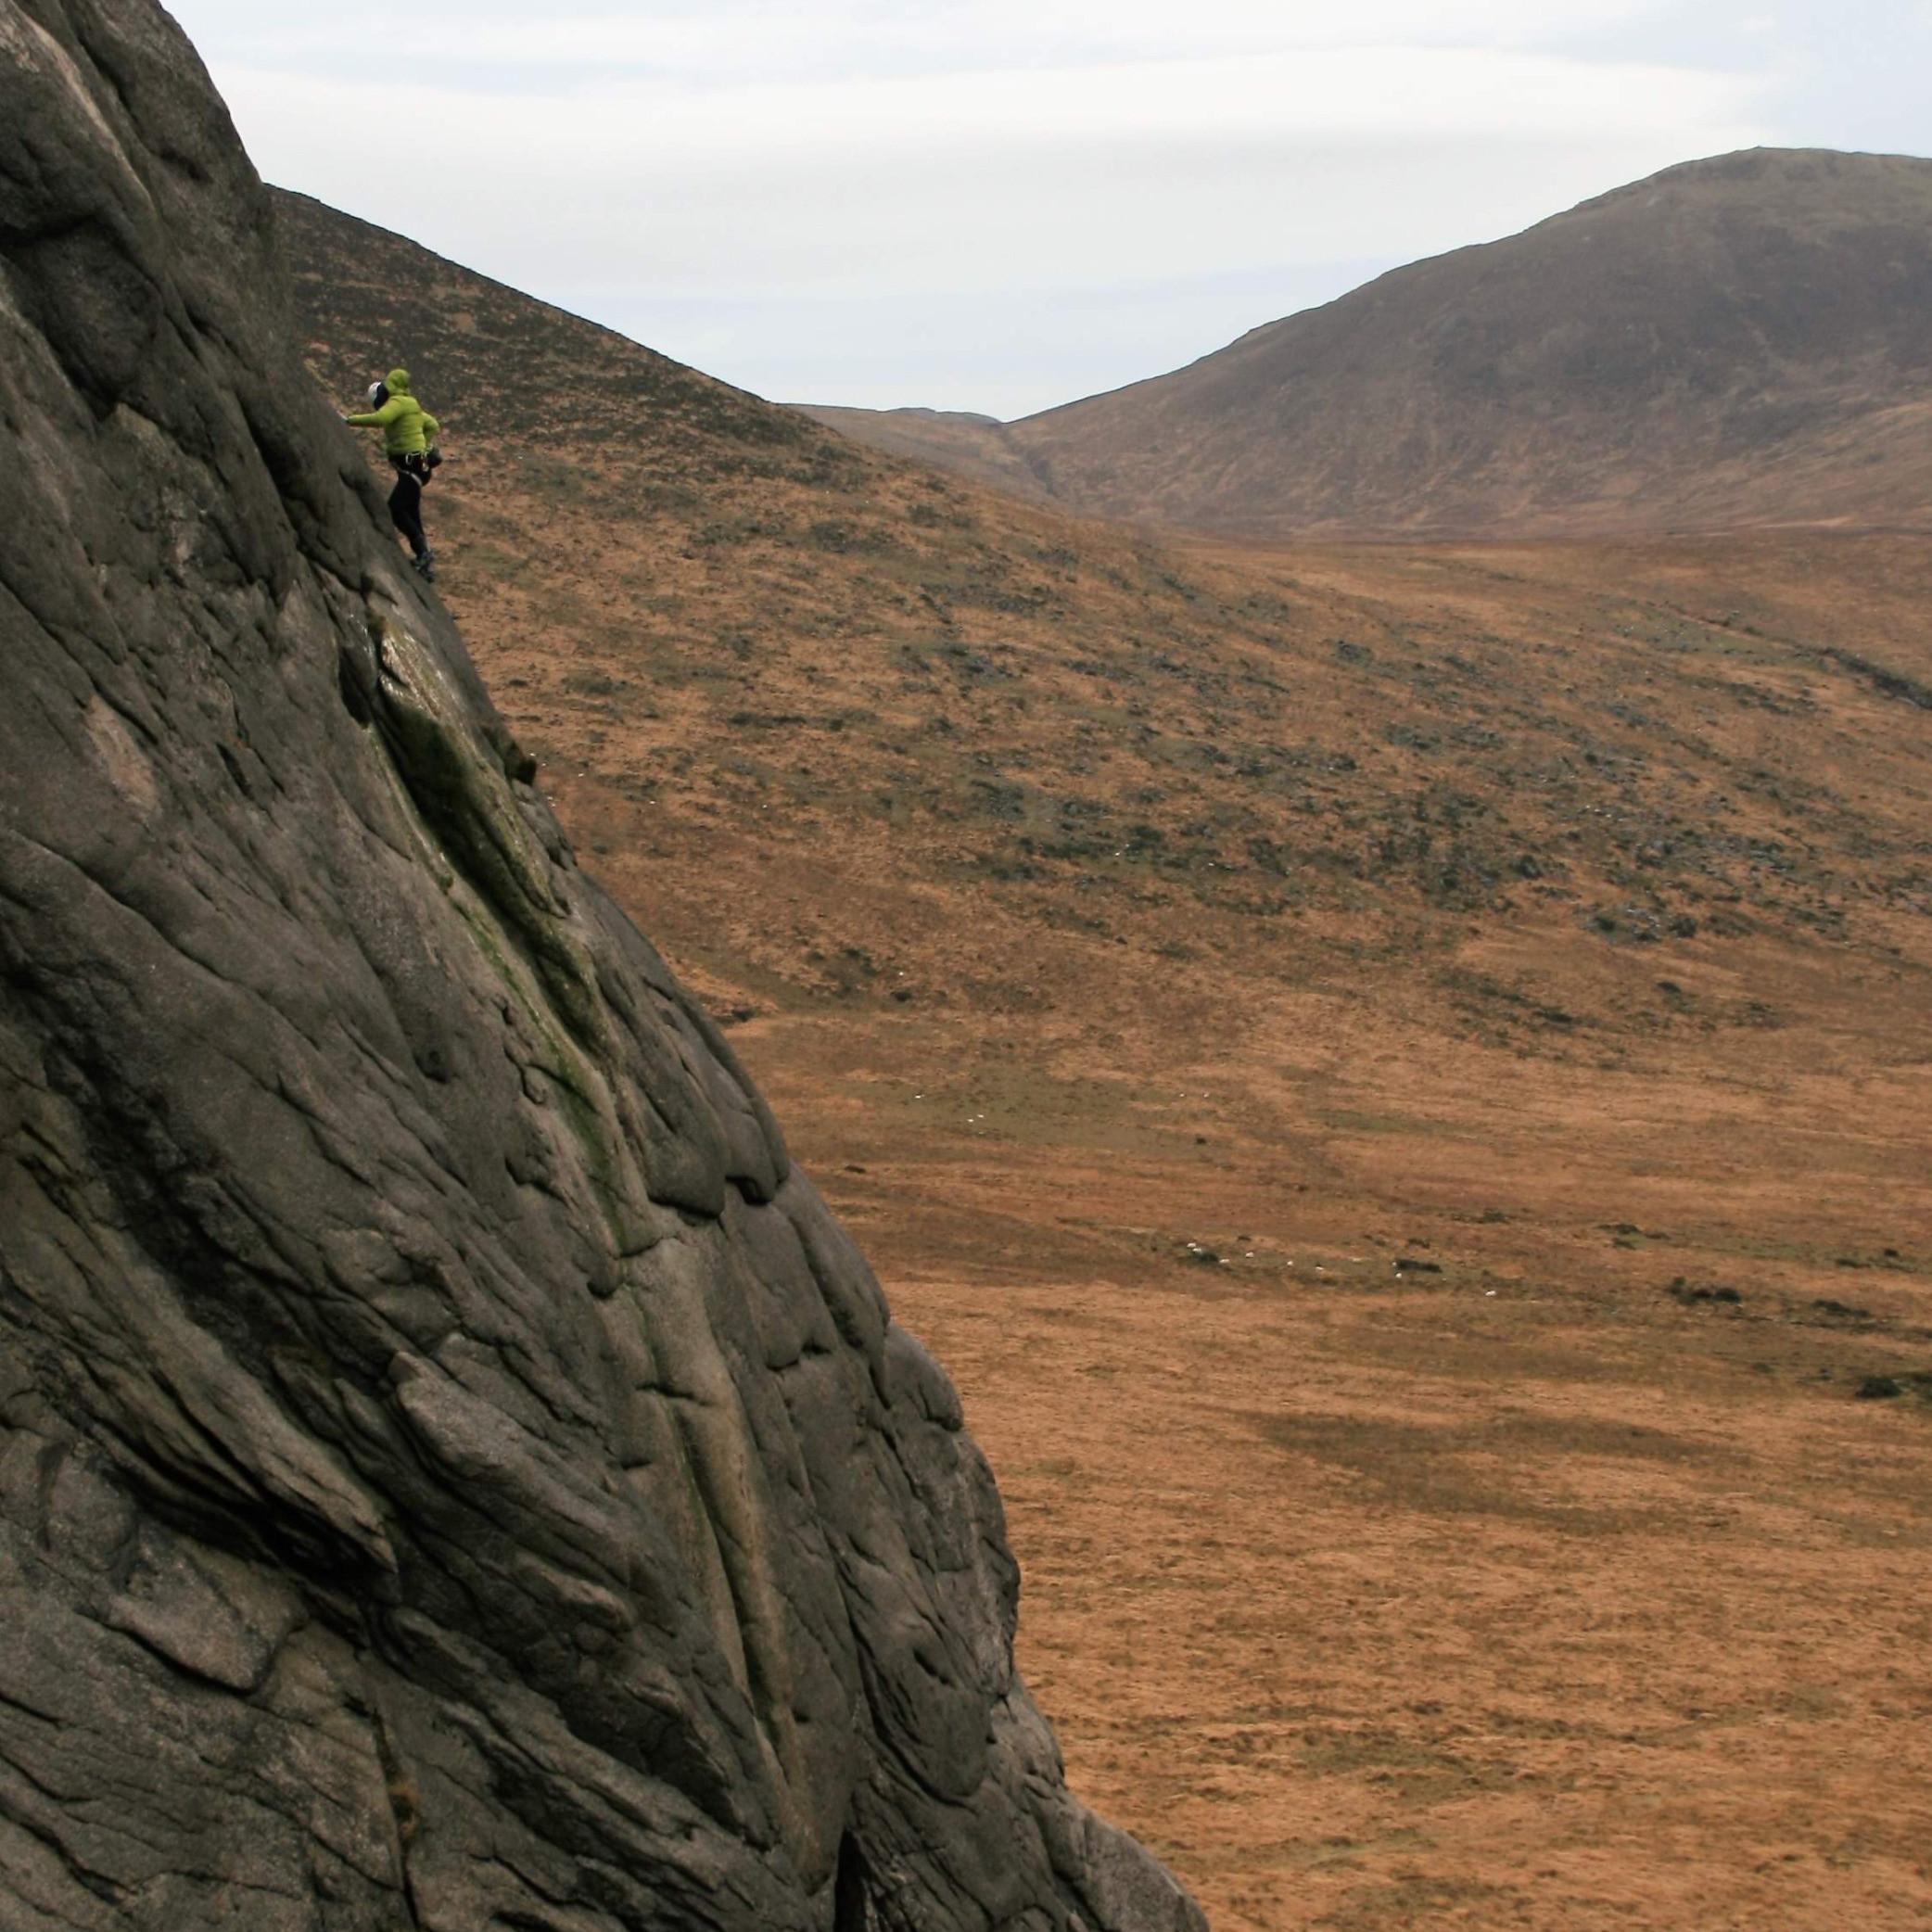 Rock Climbing Experience Day